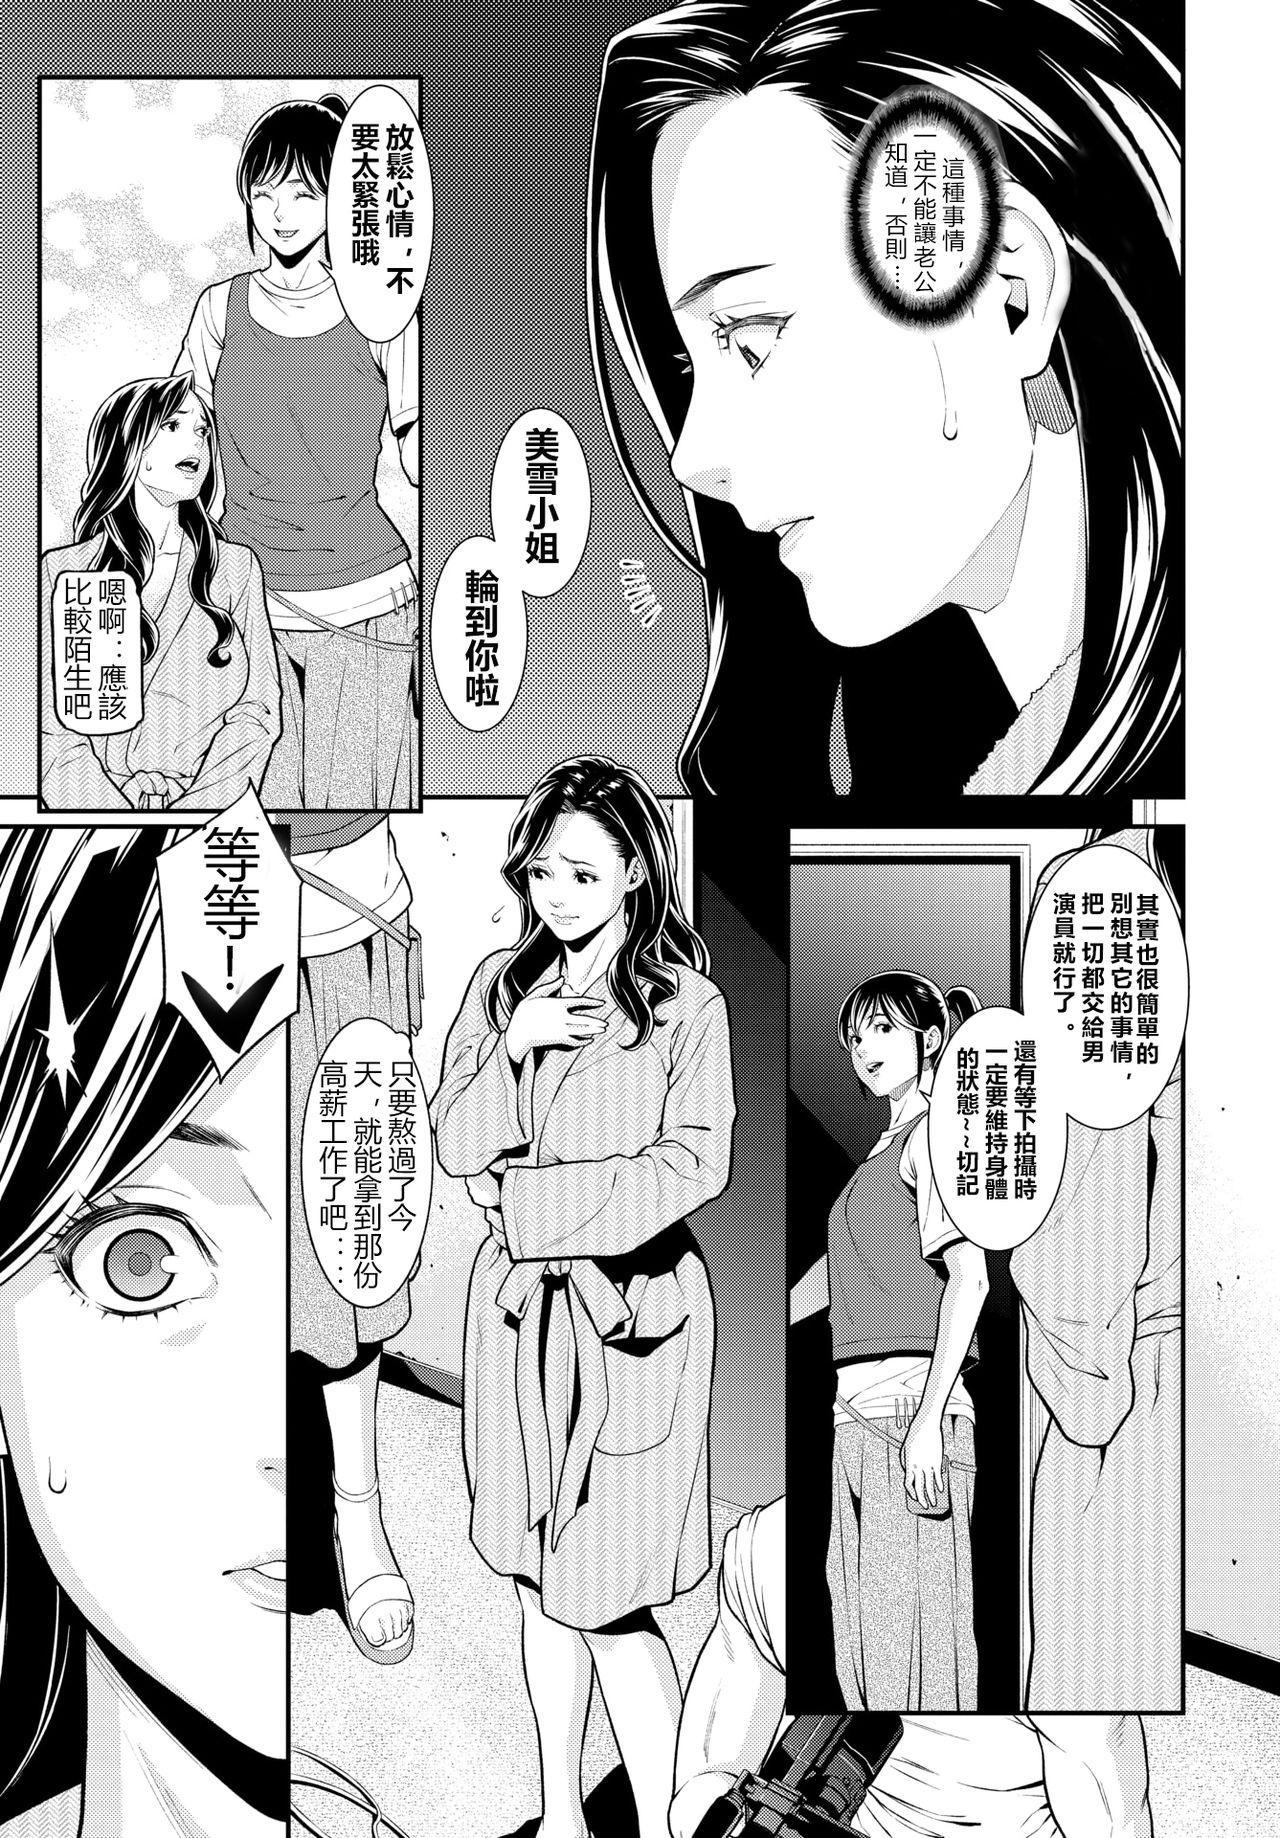 [Syuuen] Secret Wife  1-6 [Chinese][鼠灣漢化](210206最新修复完整版)【極品人妻NTR】 3